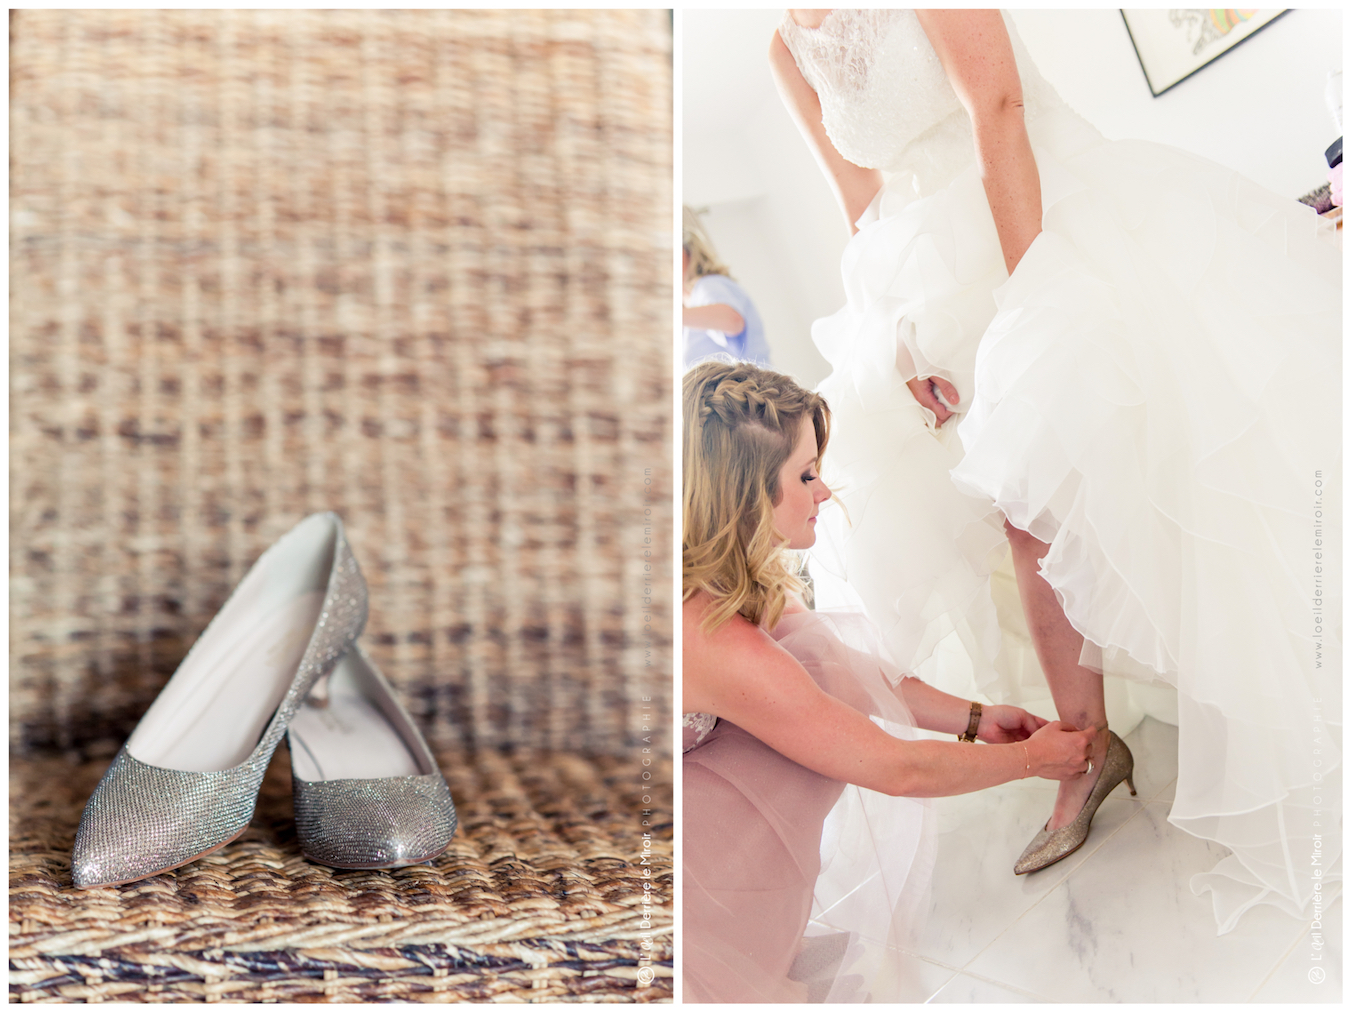 photographe-mariage-06-chateau-vaugrenier-05